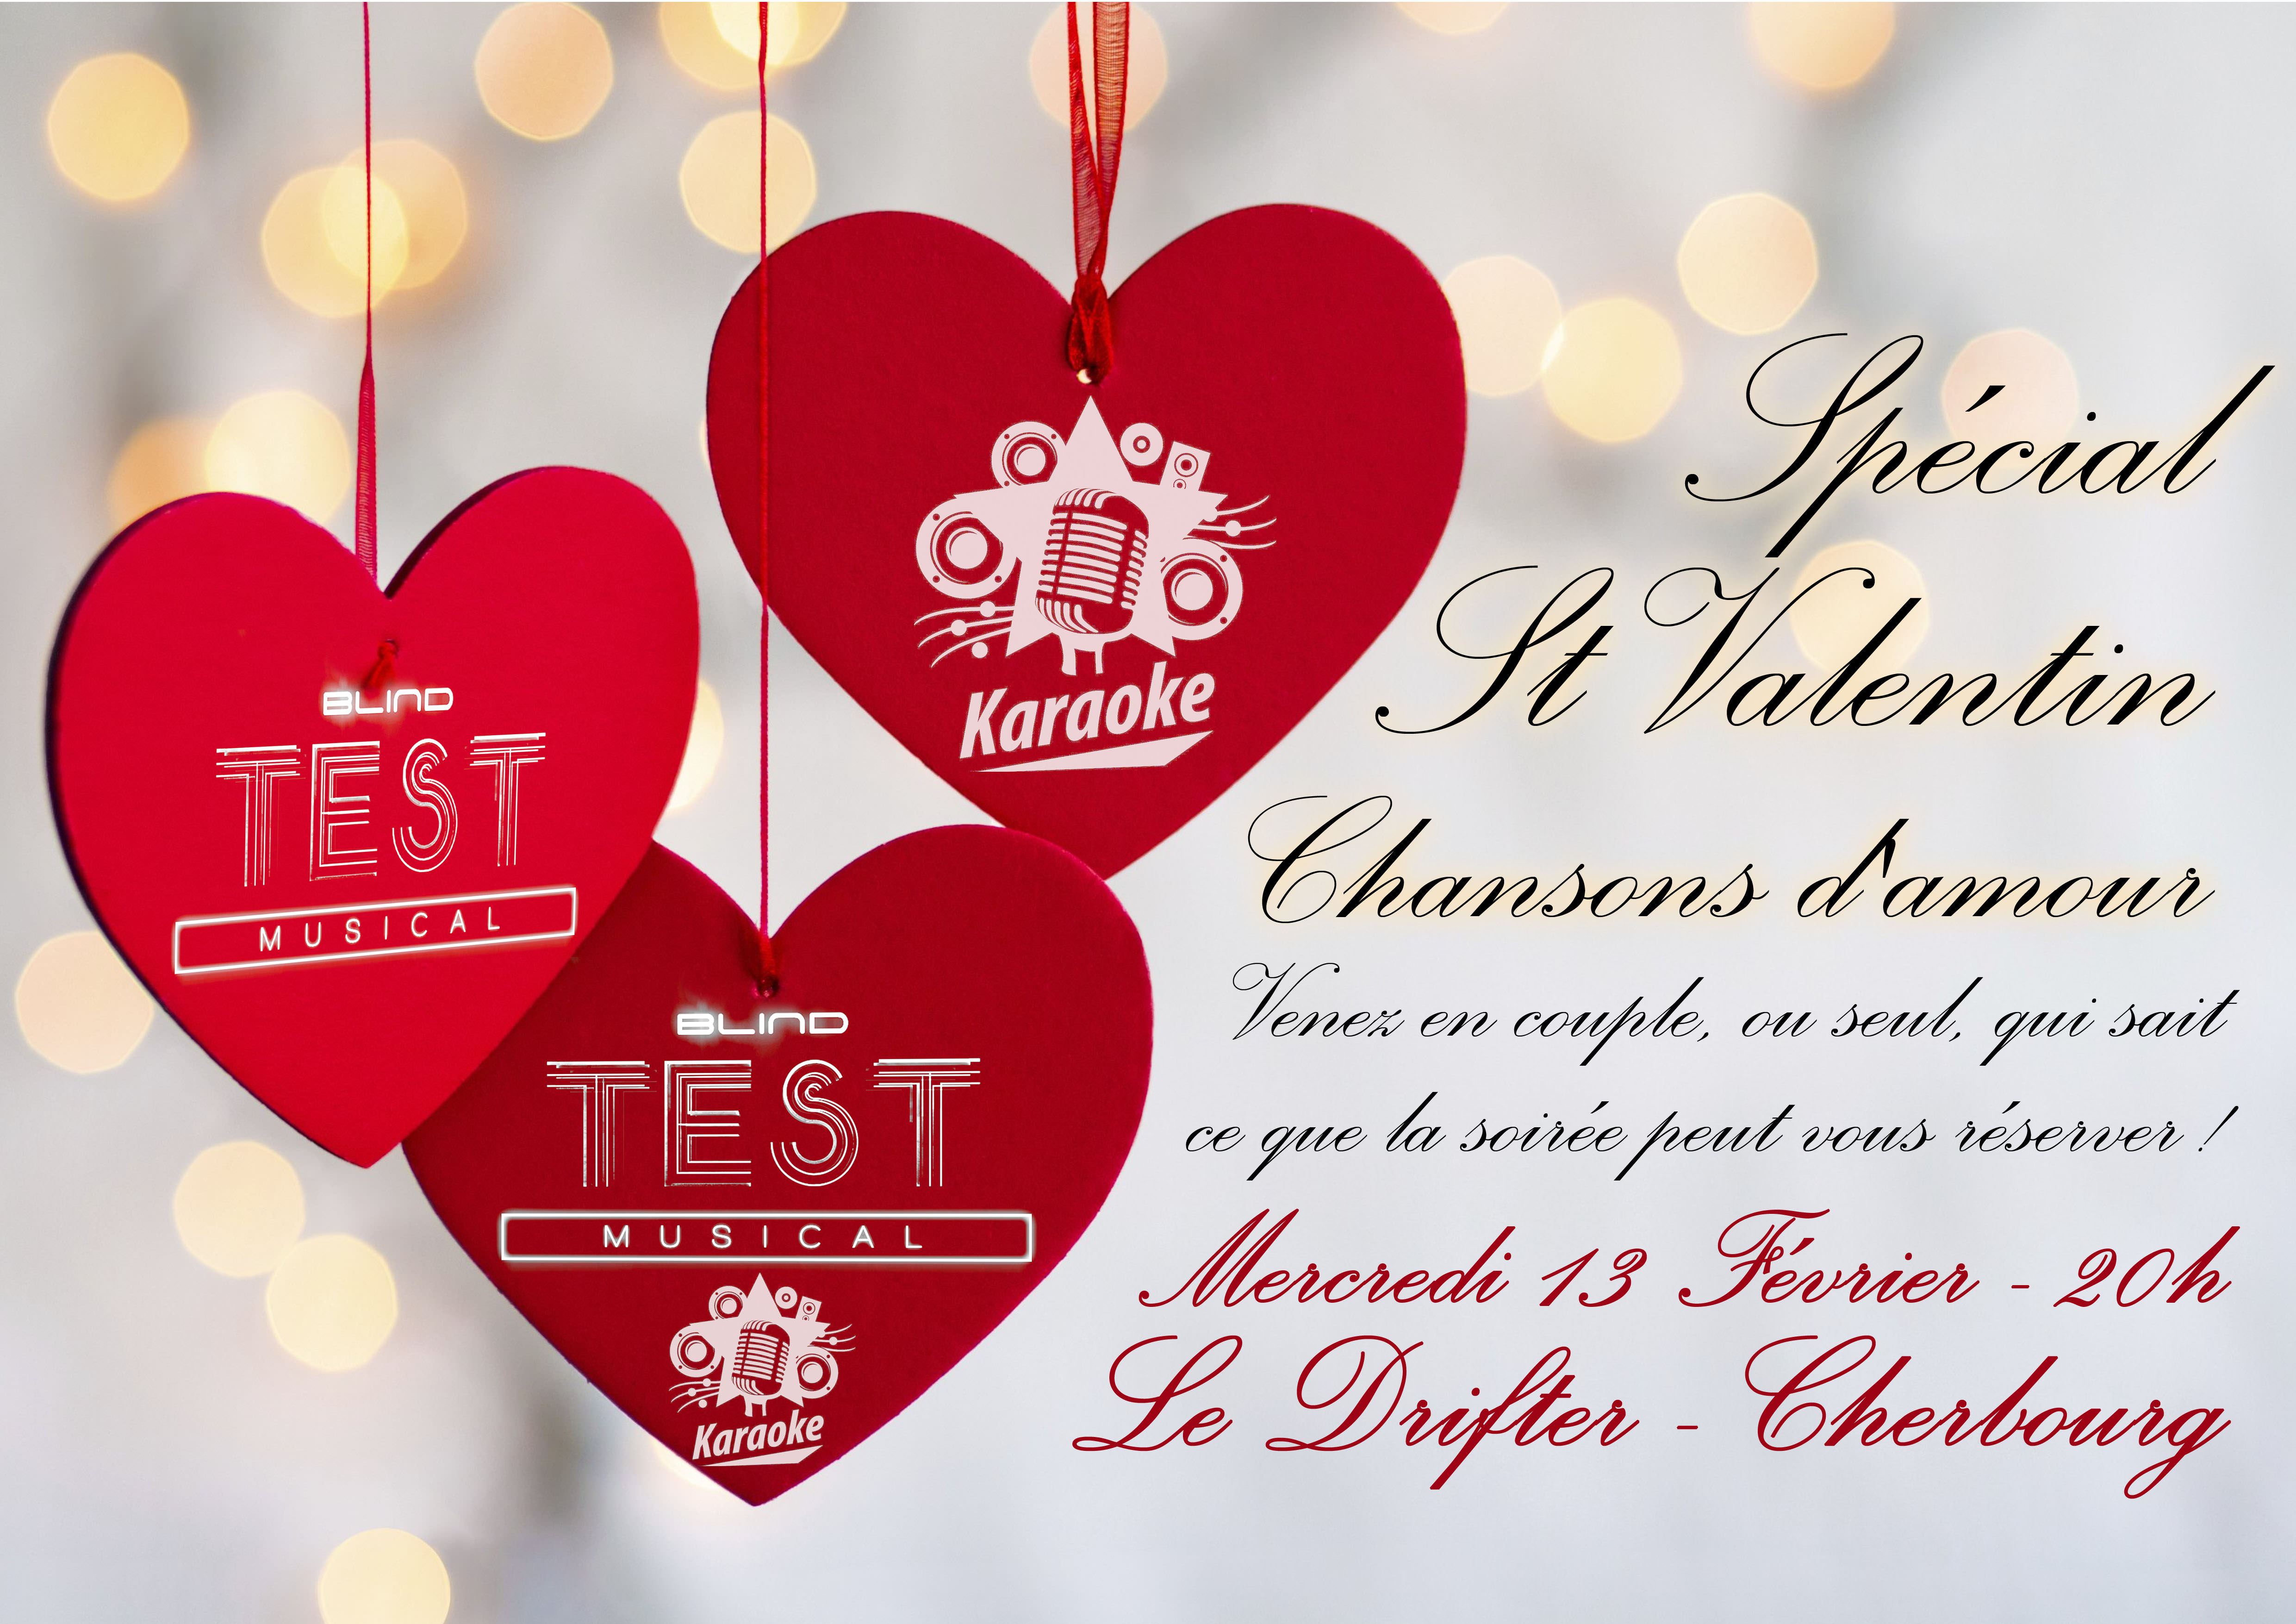 Blind Test-Karaoke «St Valentin»